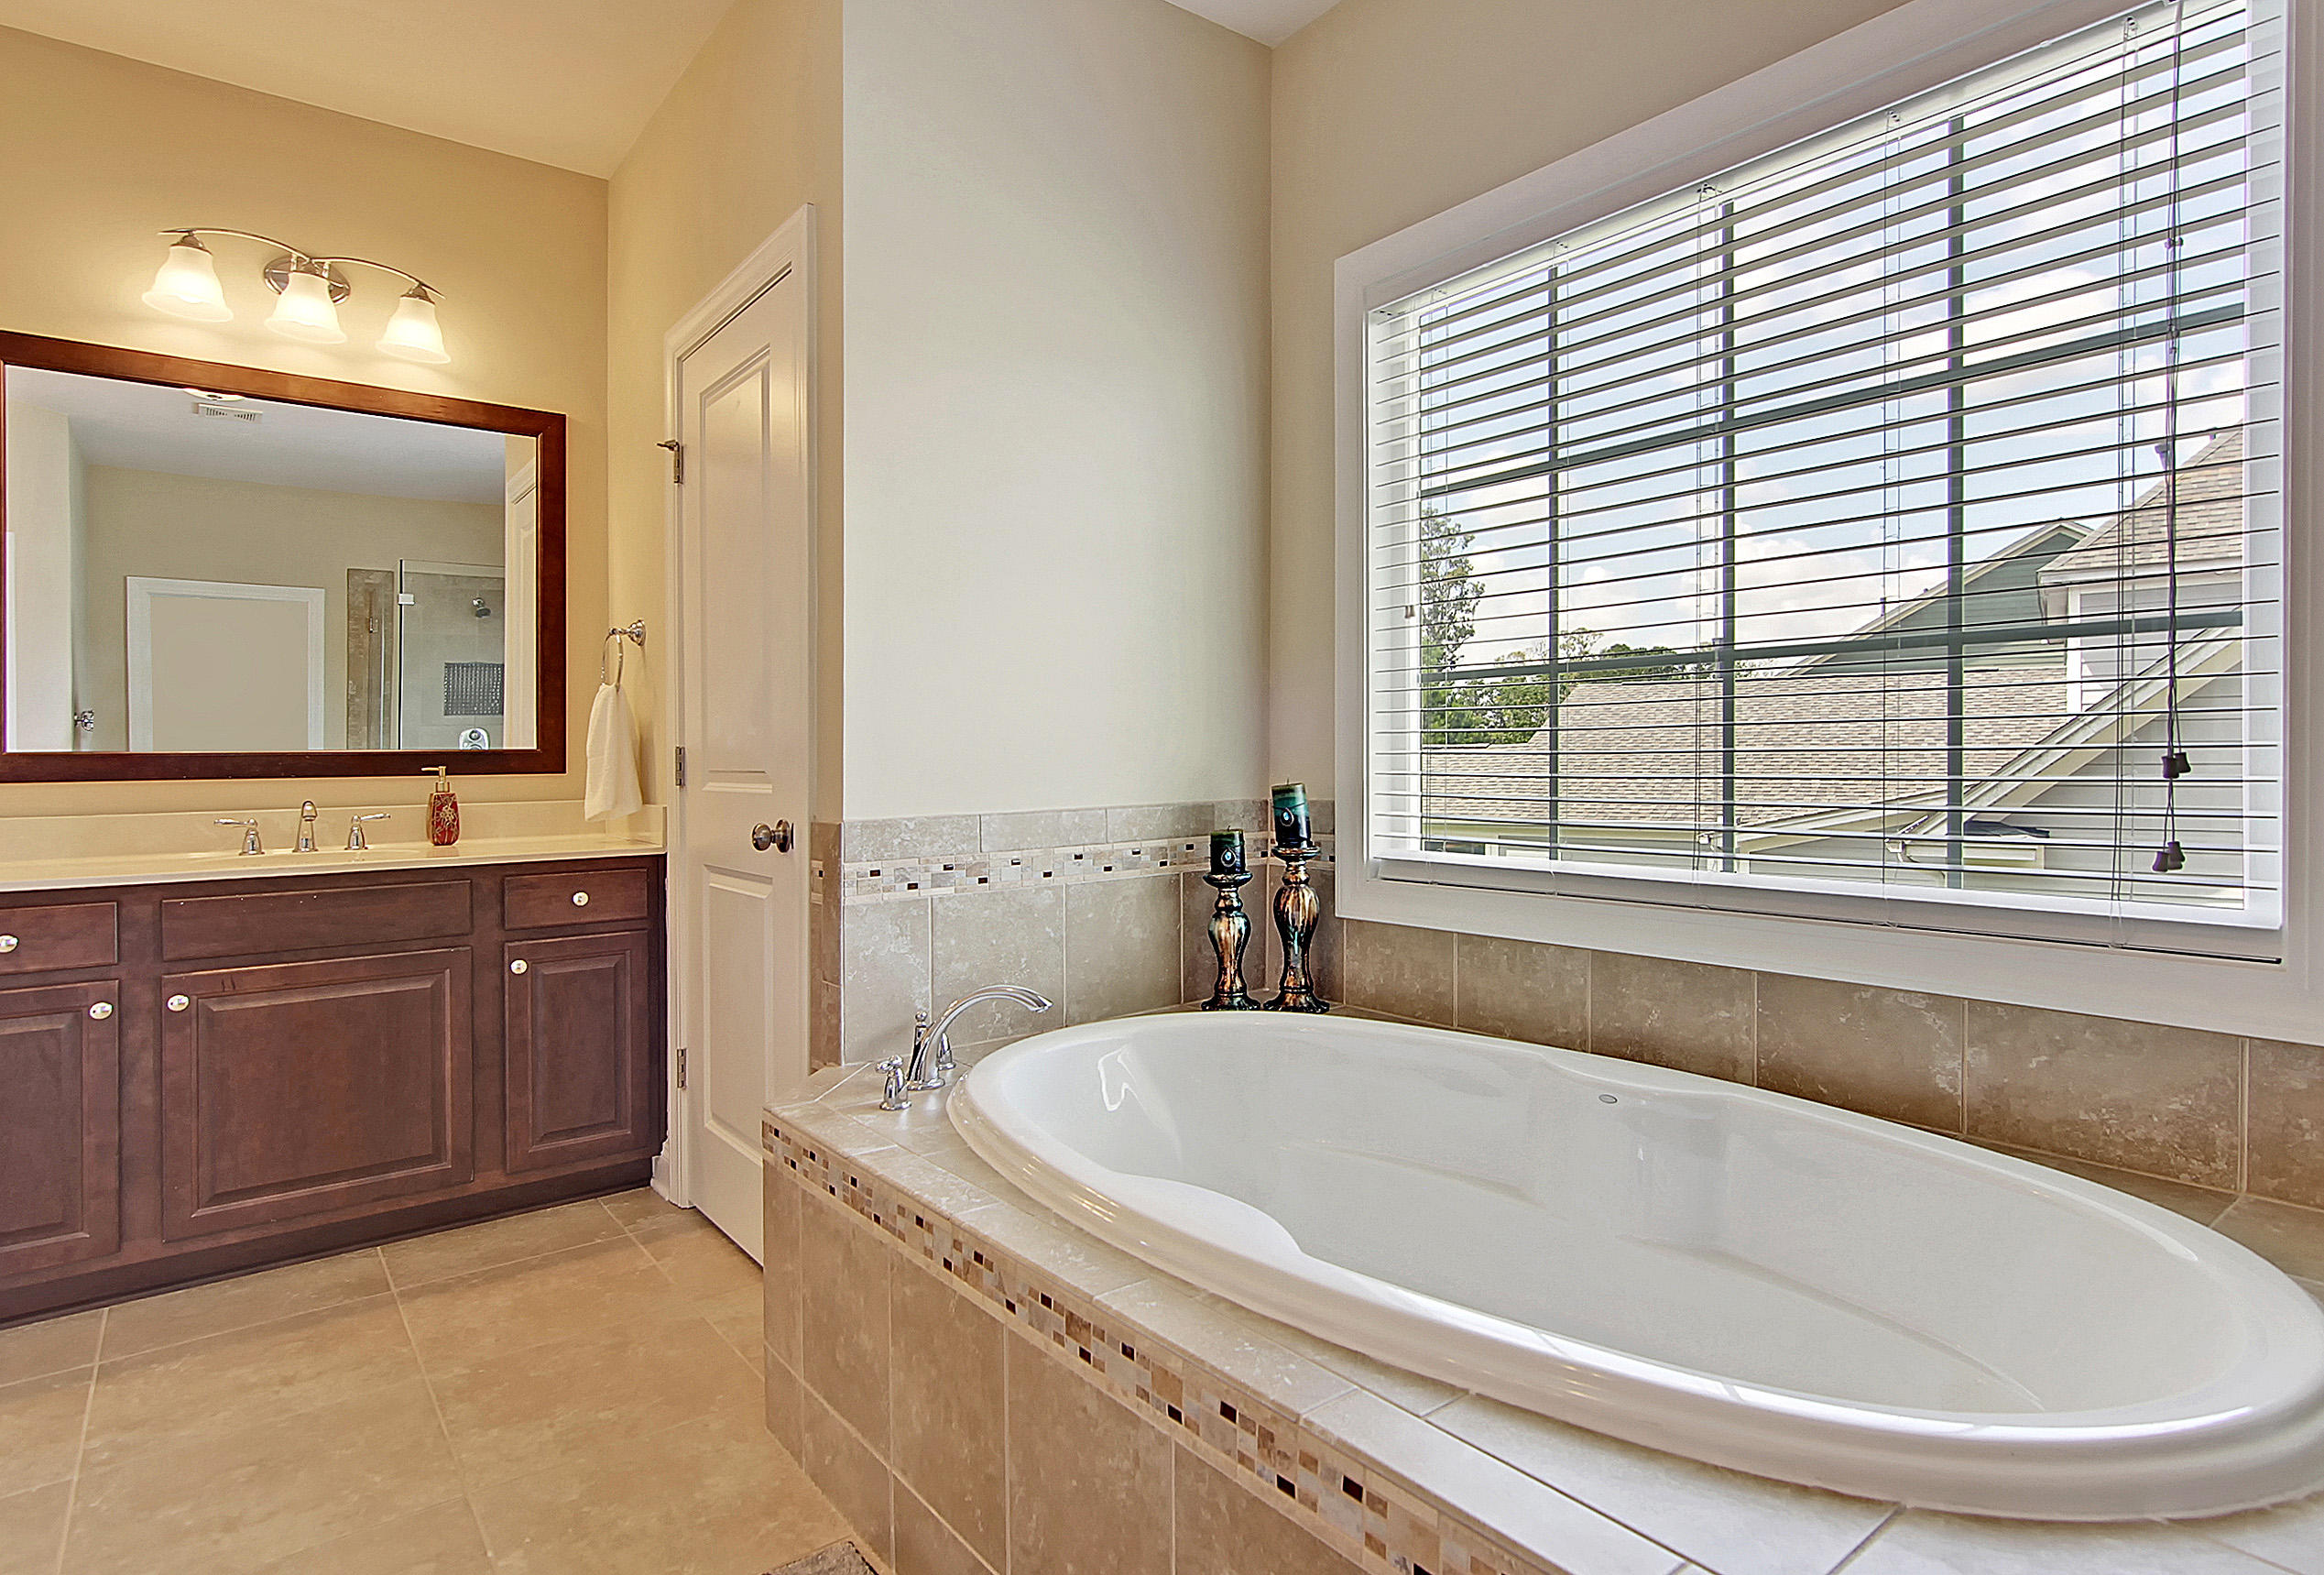 Dunes West Homes For Sale - 1332 Whisker Pole, Mount Pleasant, SC - 41